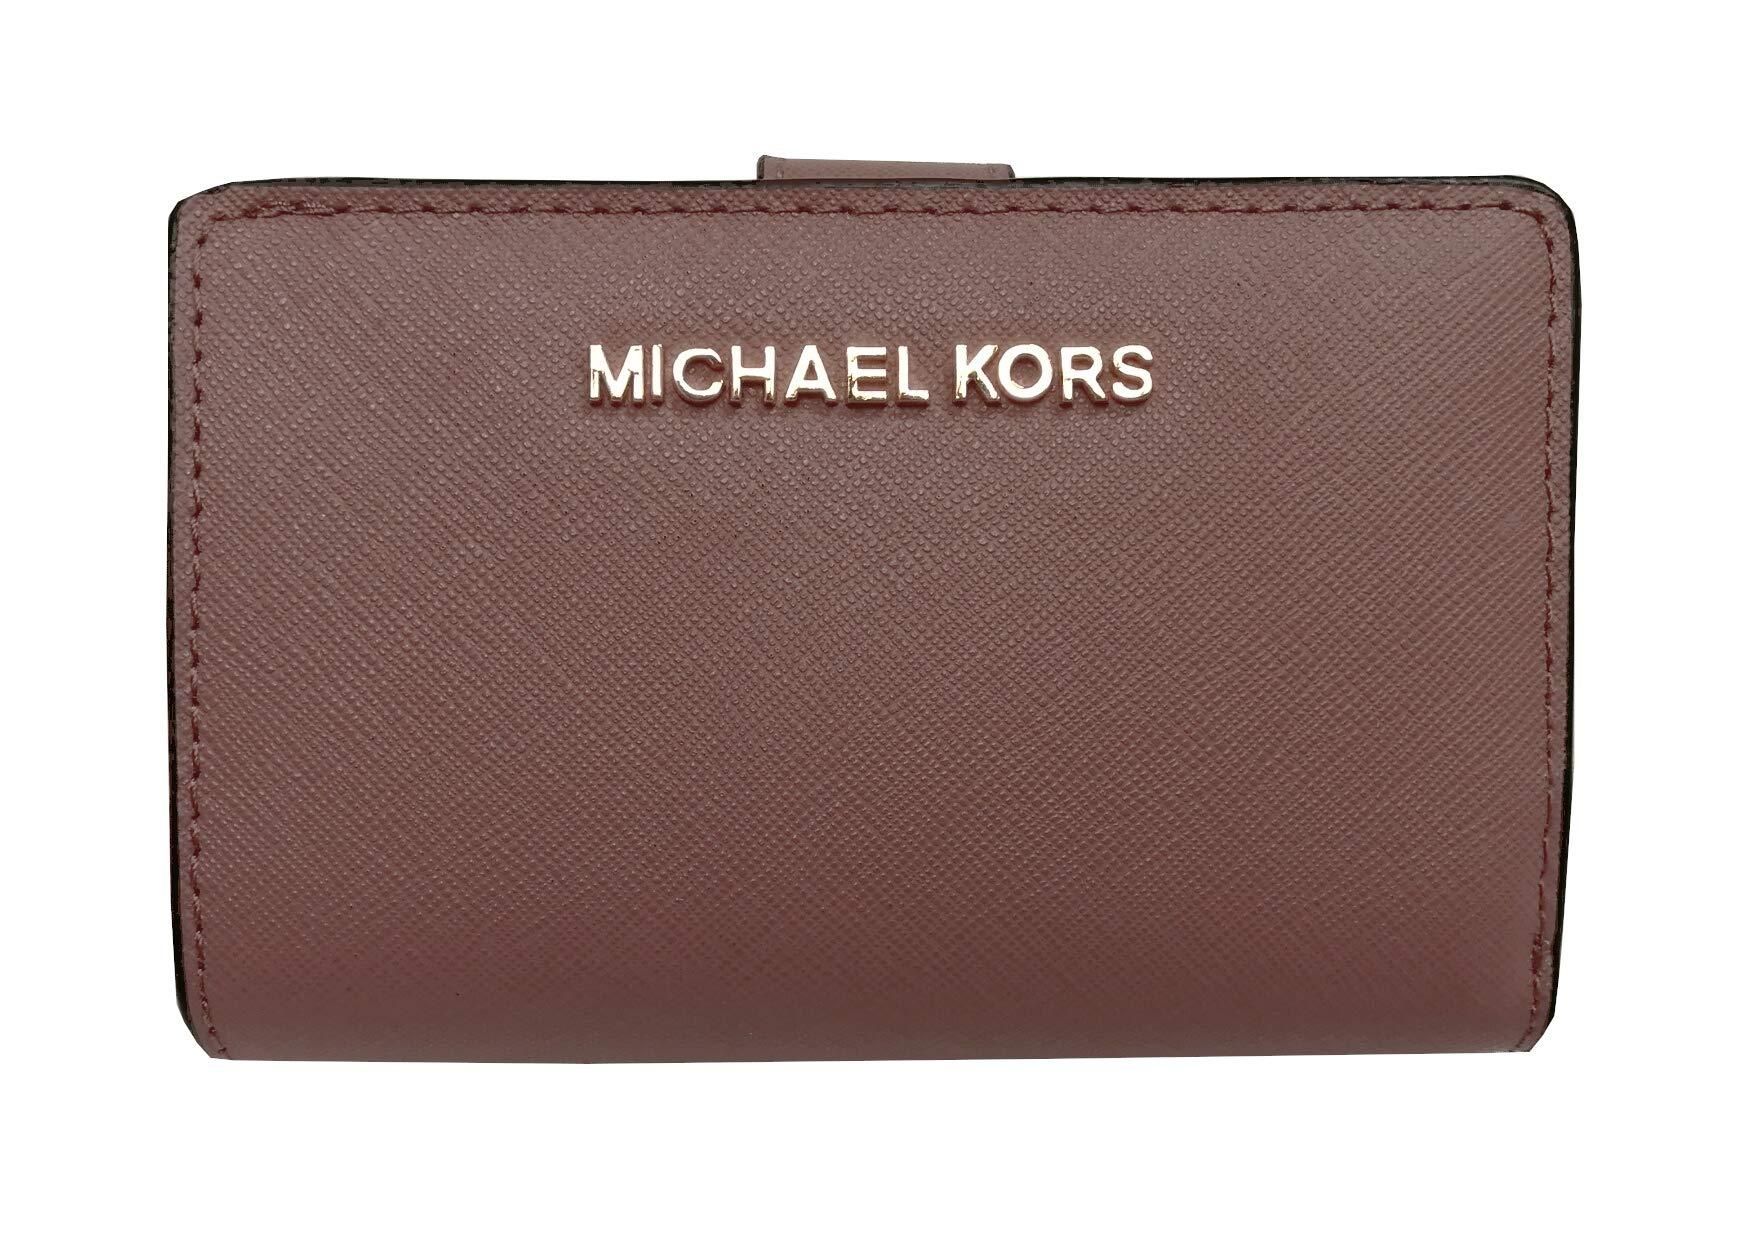 Michael Kors Jet Set Travel Saffiano Leather Bifold Zip Coin Wallet (Dusty Rose)